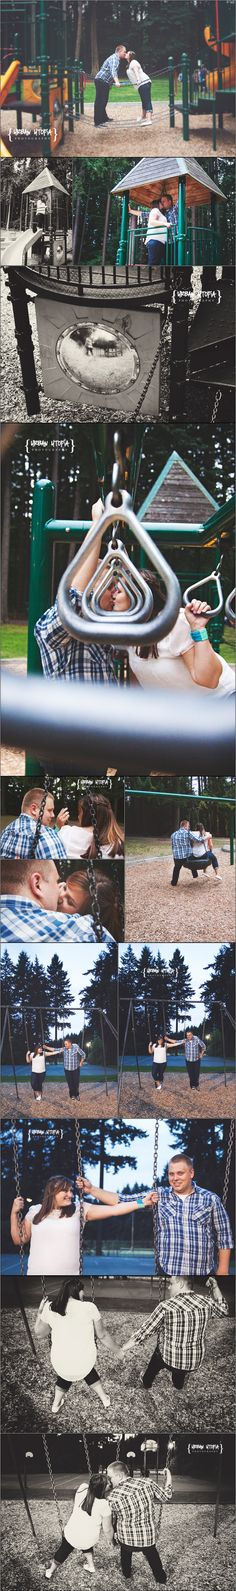 PreFunk Engagement Session, Lynnwood Engagement, Root Beer Store, Washington Photographer, Unique Engagement Photos, Urban Utopia Photography, Playground engagement session, park couple session, playground couple session www.urbanutopiaphotography.com